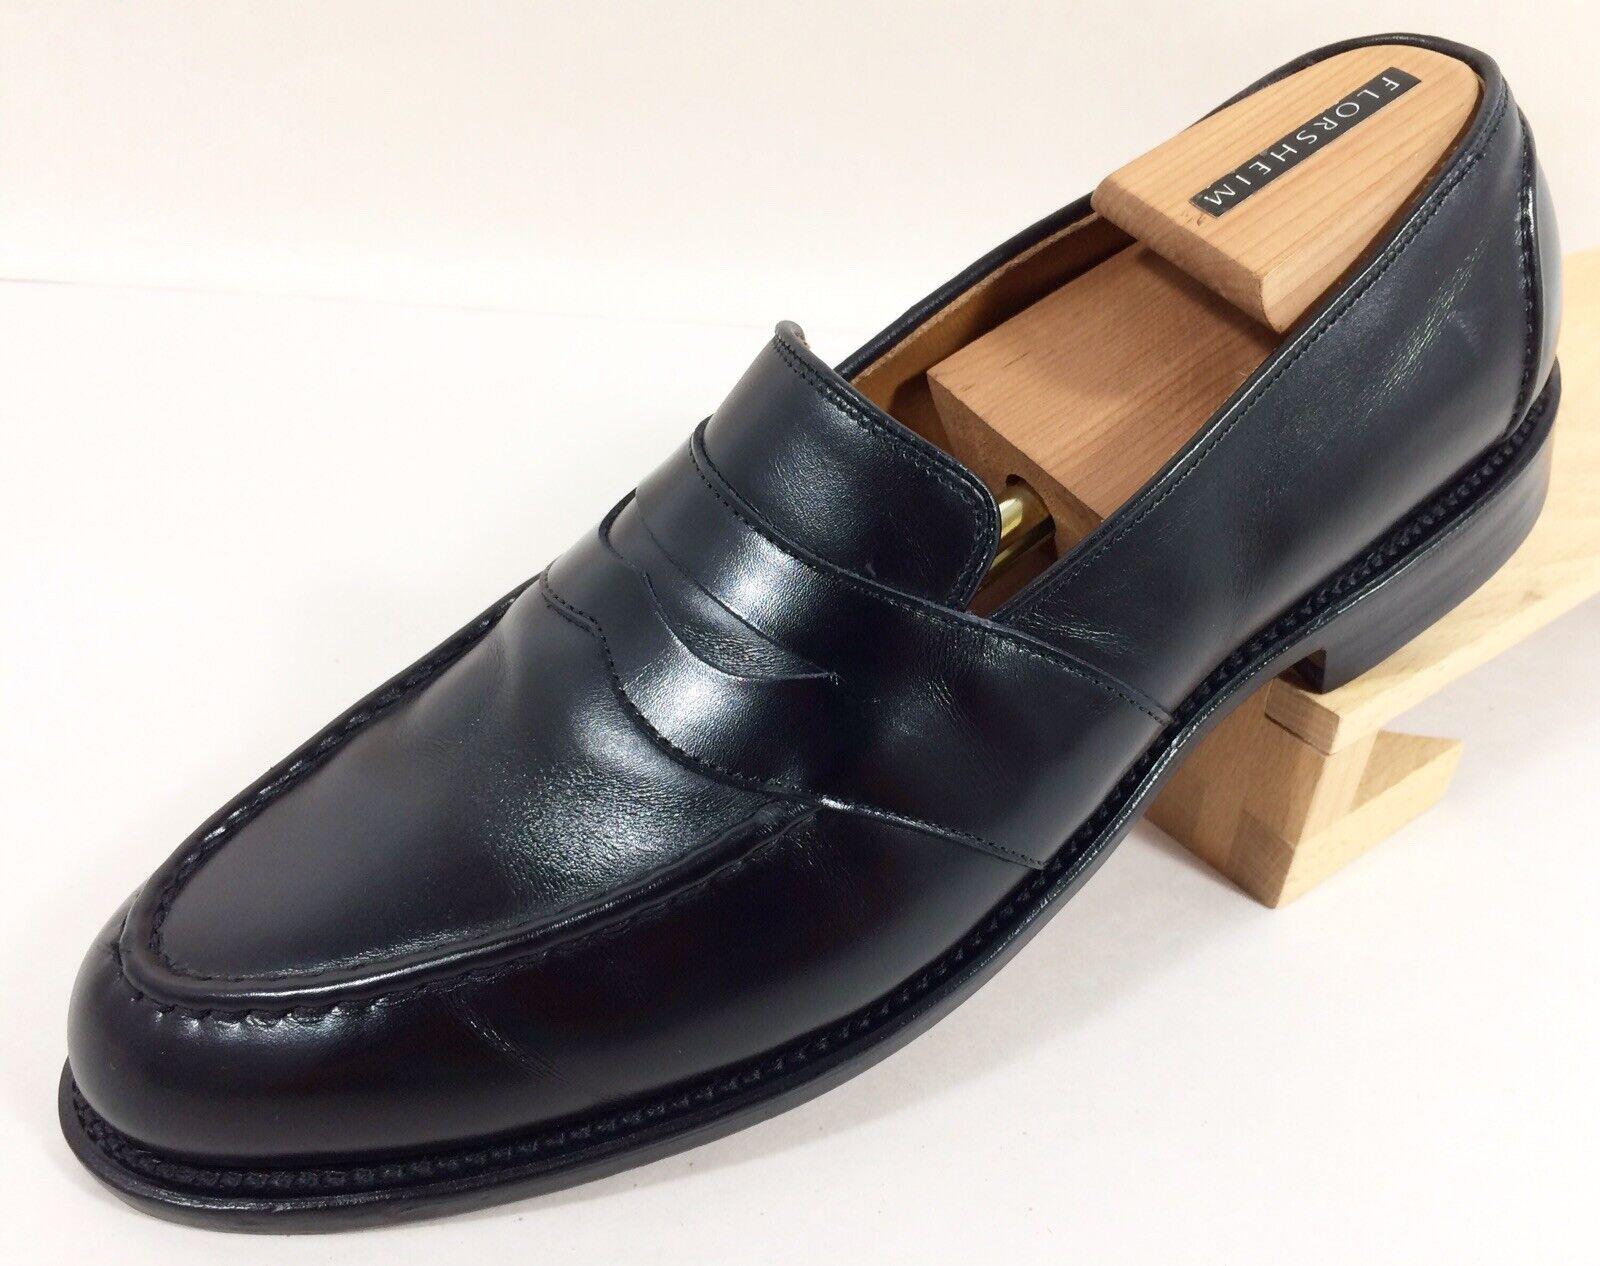 Allen Edmonds  RANDOLPH  Penny Loafer Black Slip-on Men US 11.5 B  EU 45.5  4809